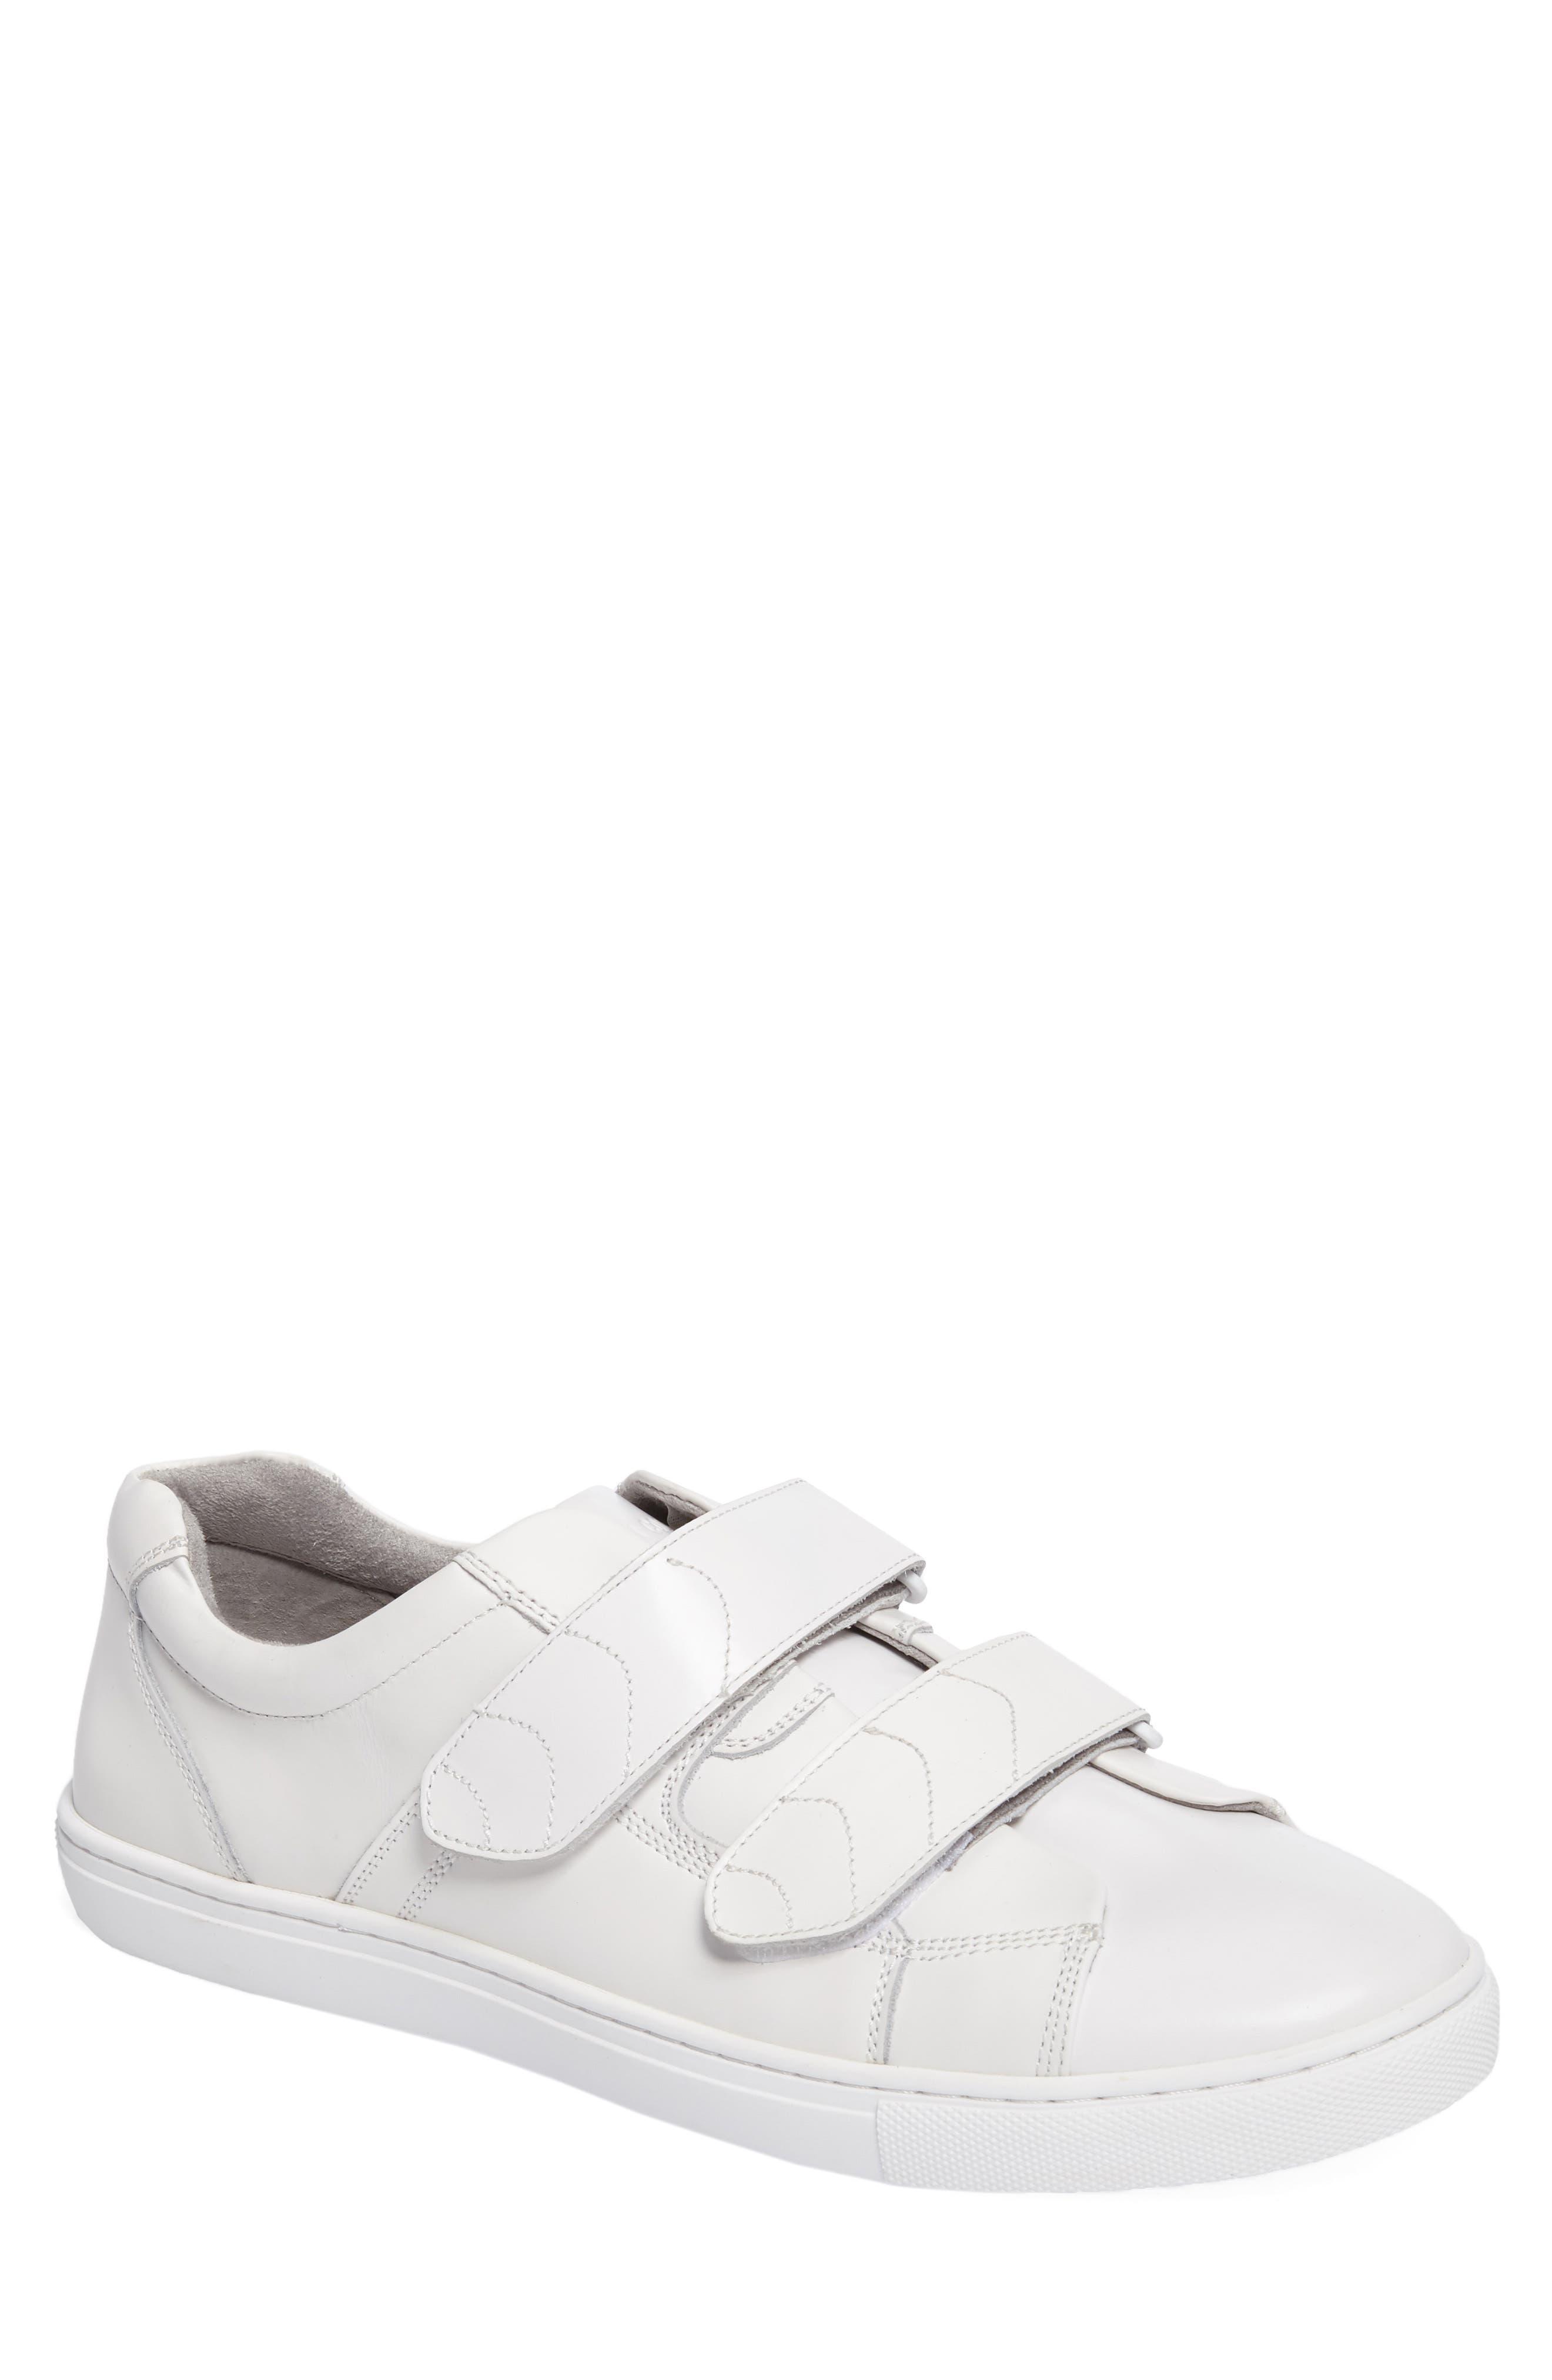 Kenneth Cole New York Low Top Sneaker (Men)